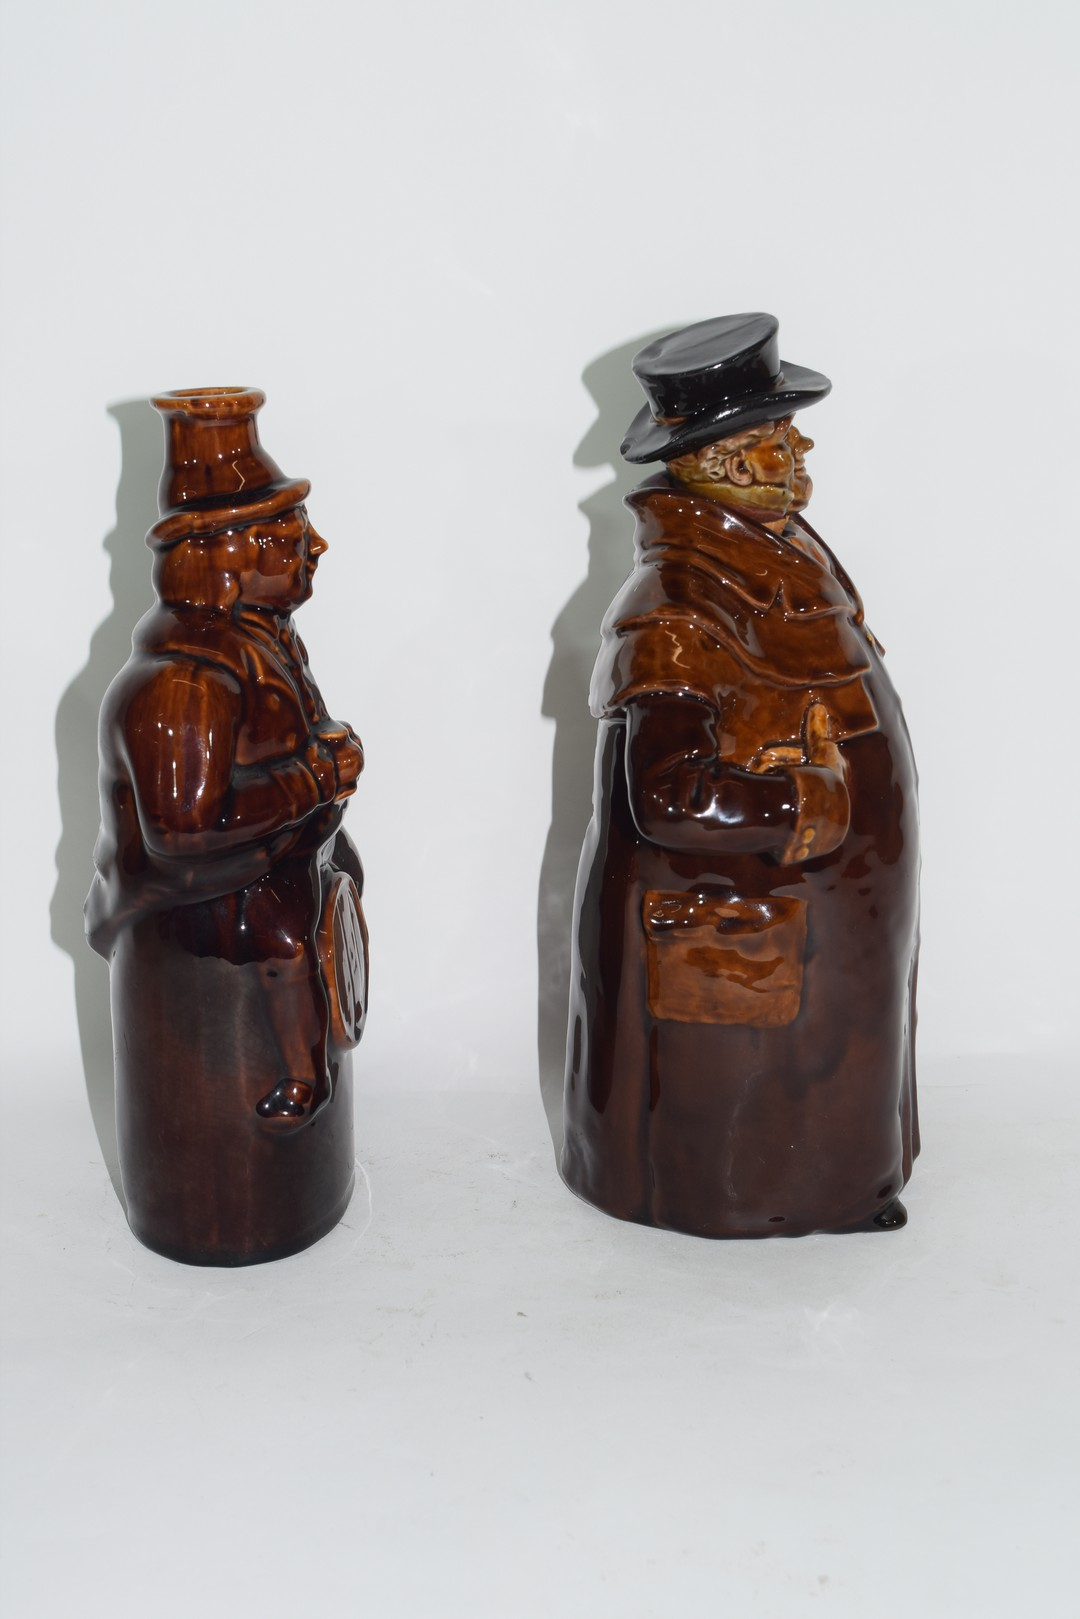 Royal Doulton Kingsware flask - Image 2 of 5